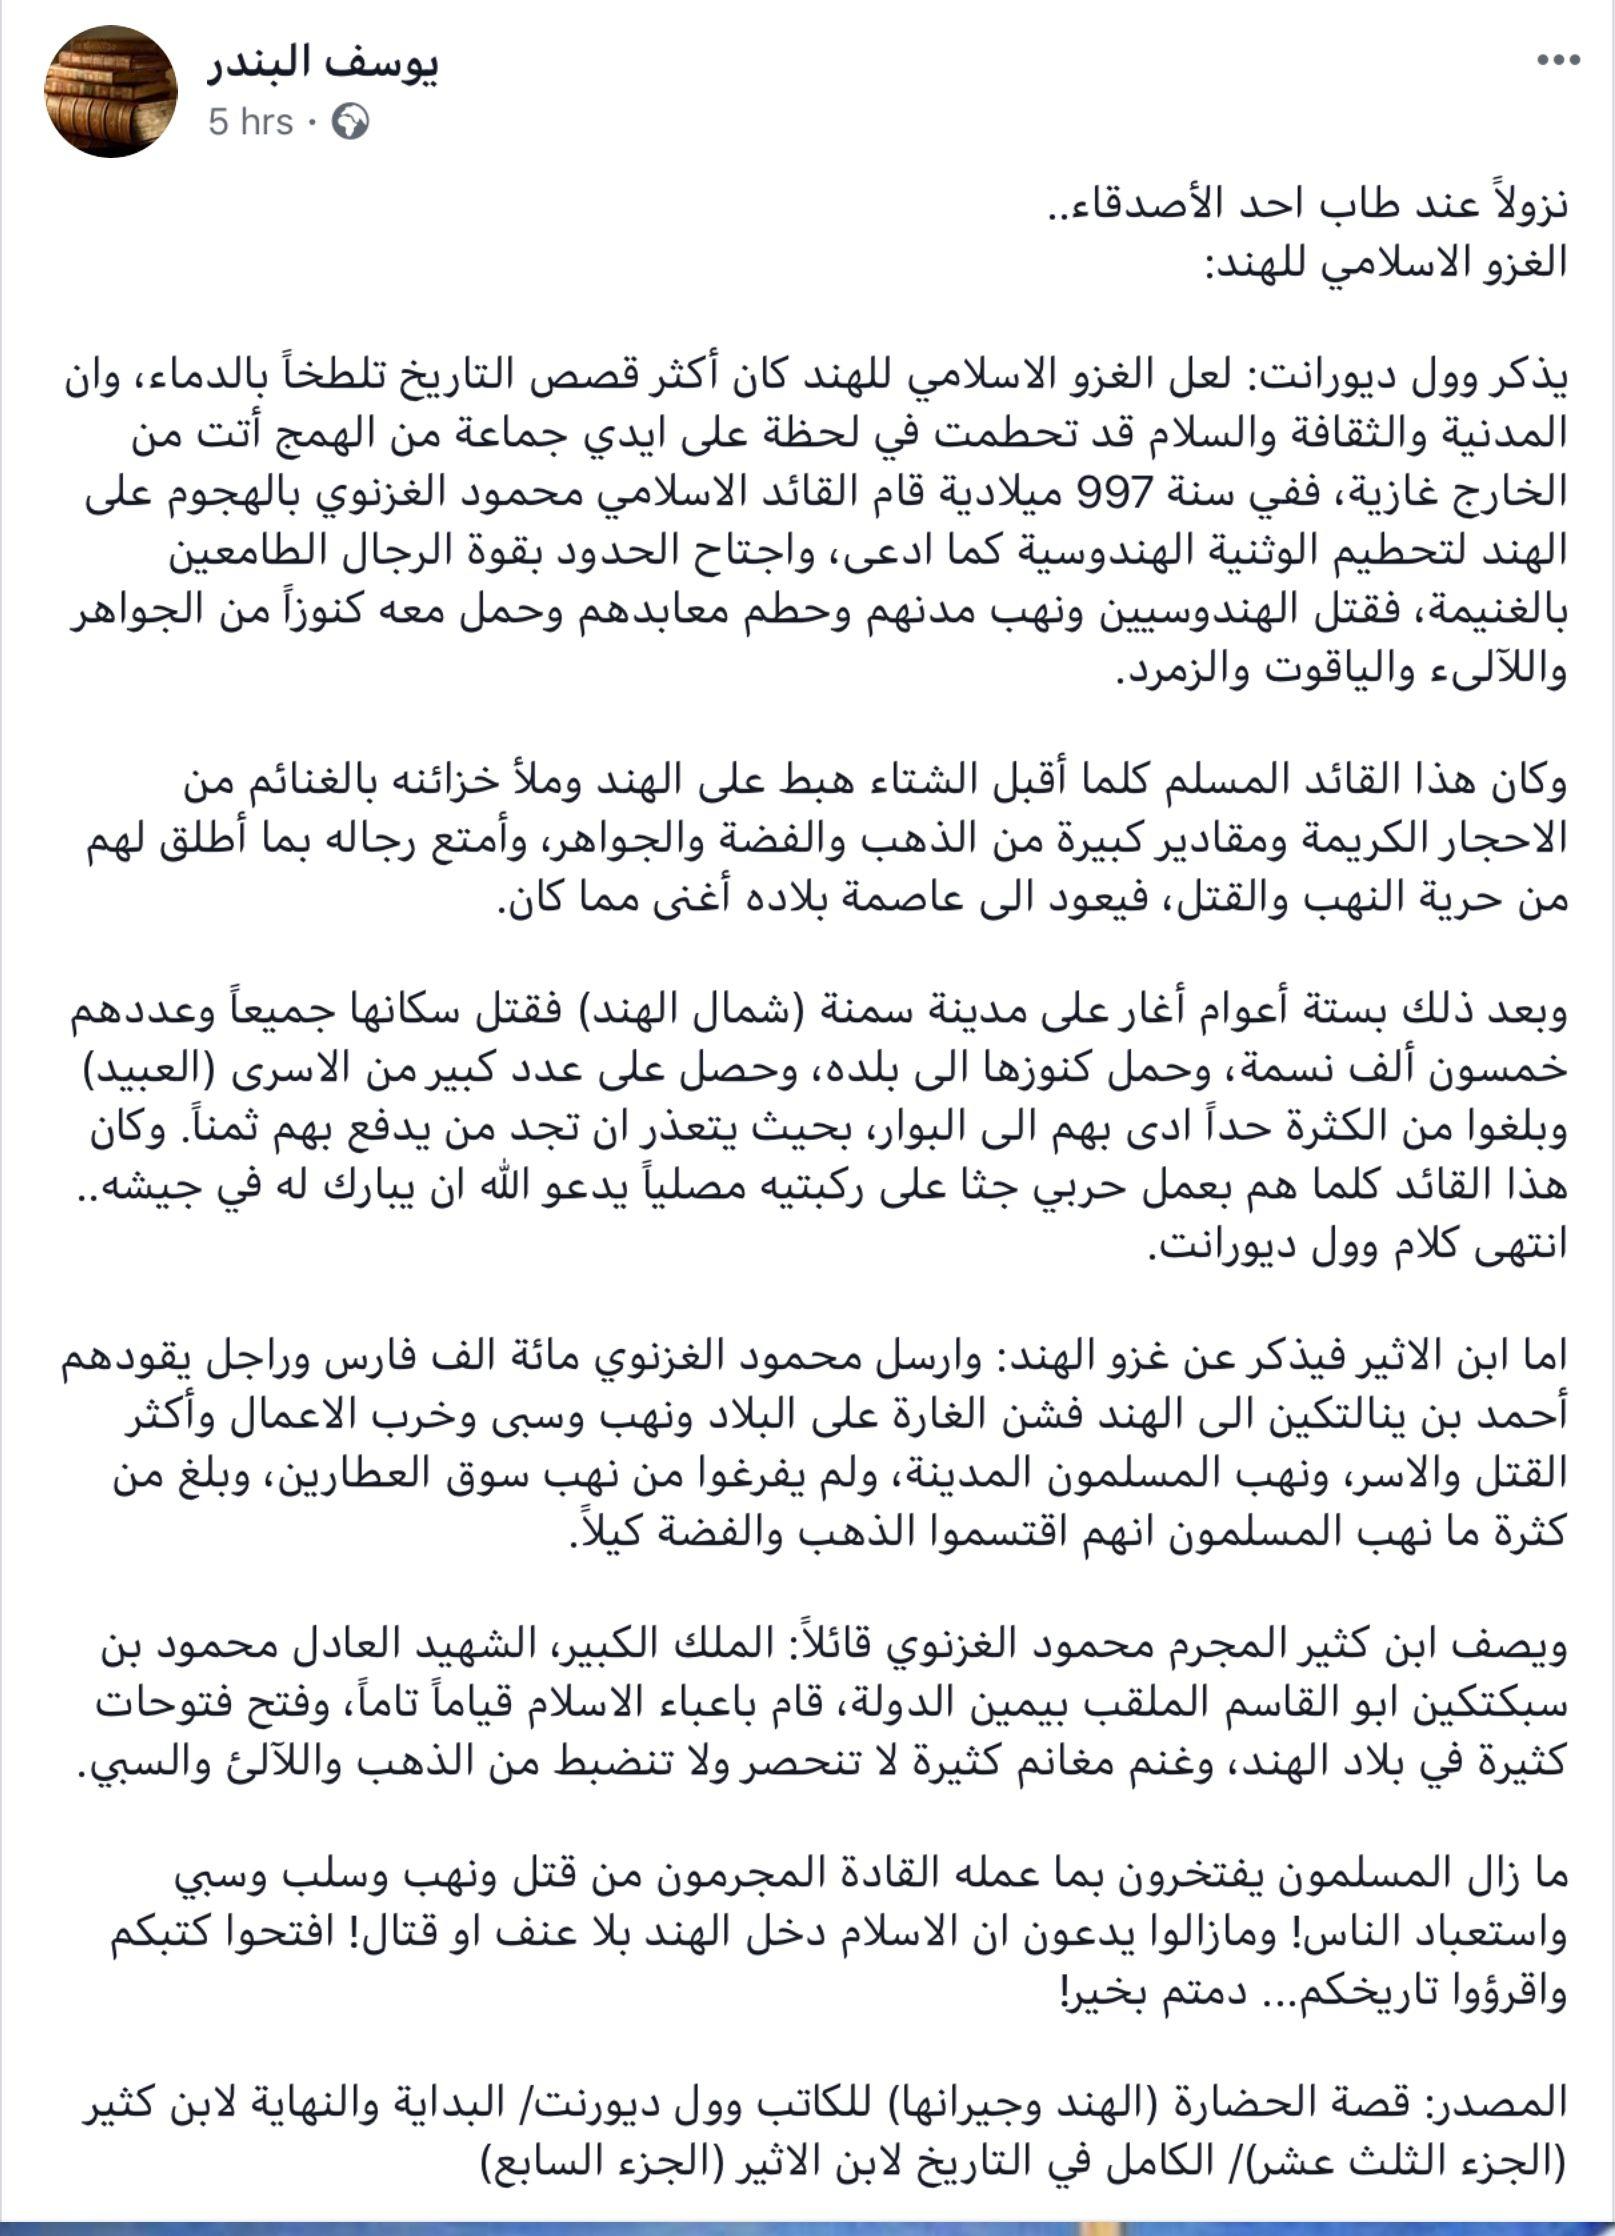 Pin By Joseph Youssef On Islam S Culture Islamic Culture Culture Islam